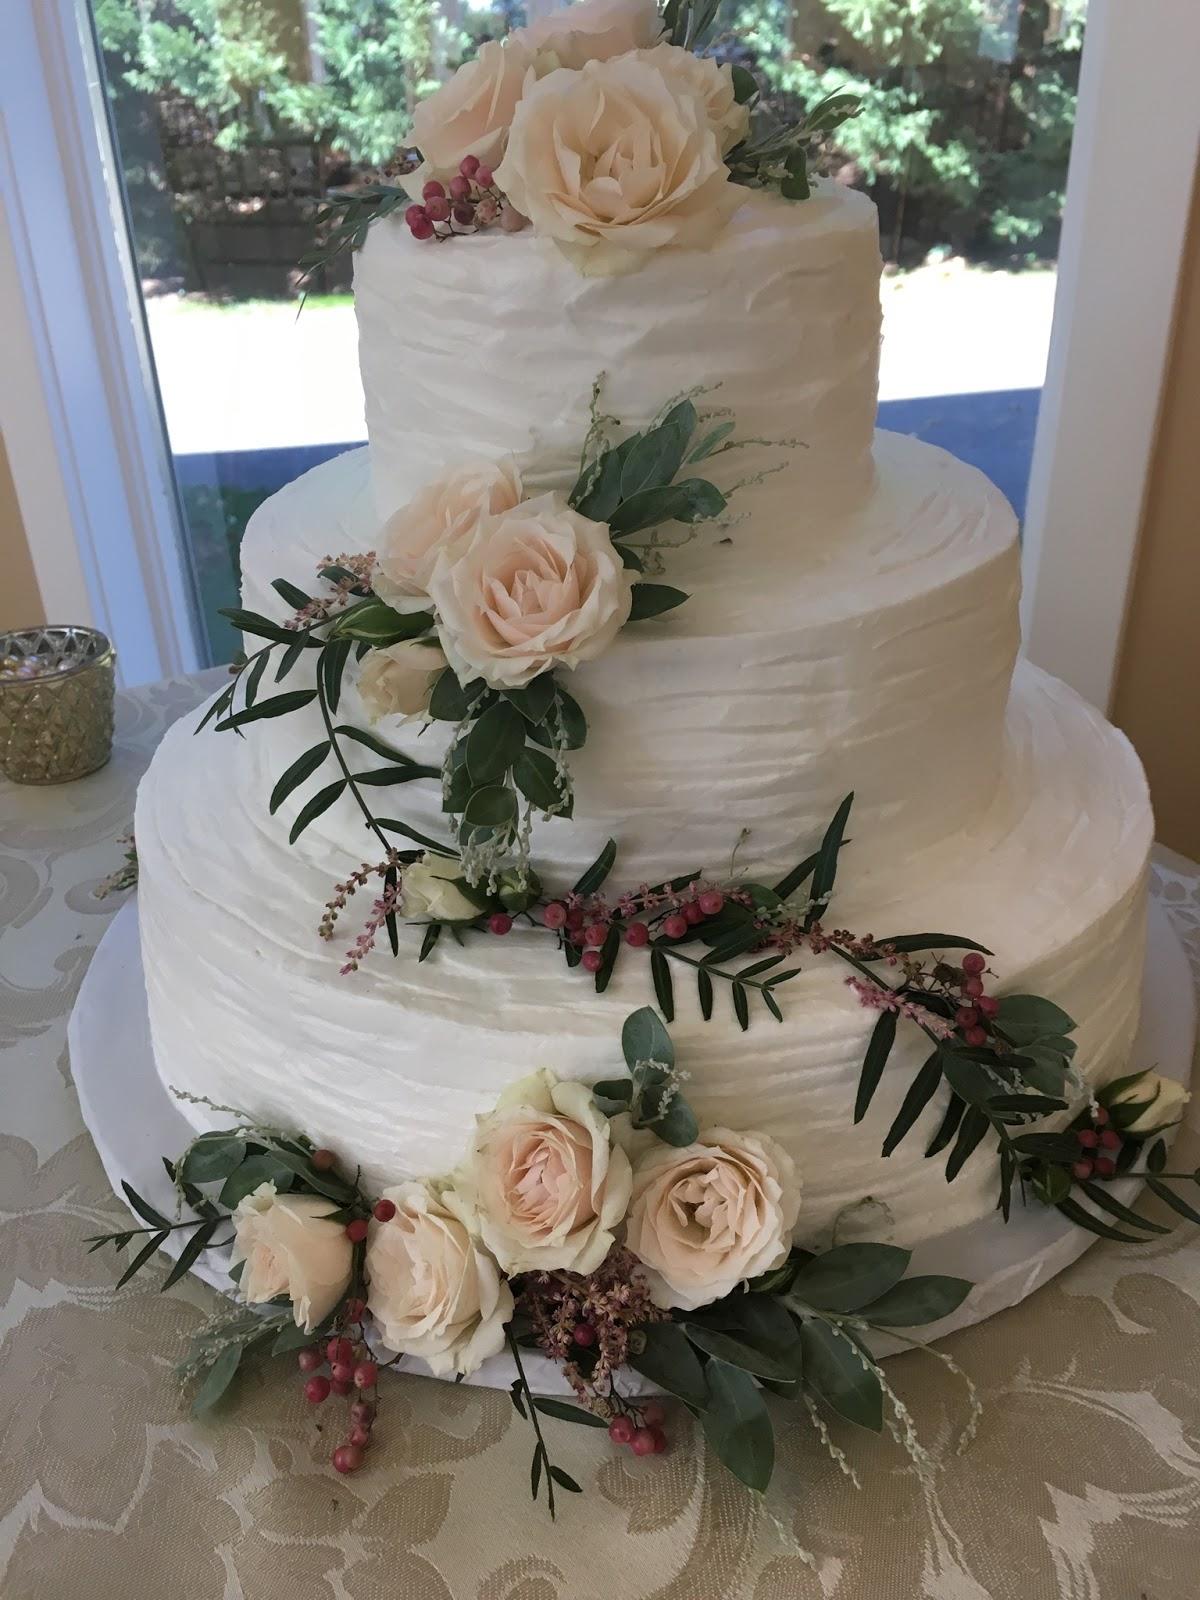 Catering A Wedding Reception At Snyder Center Alexandria Va